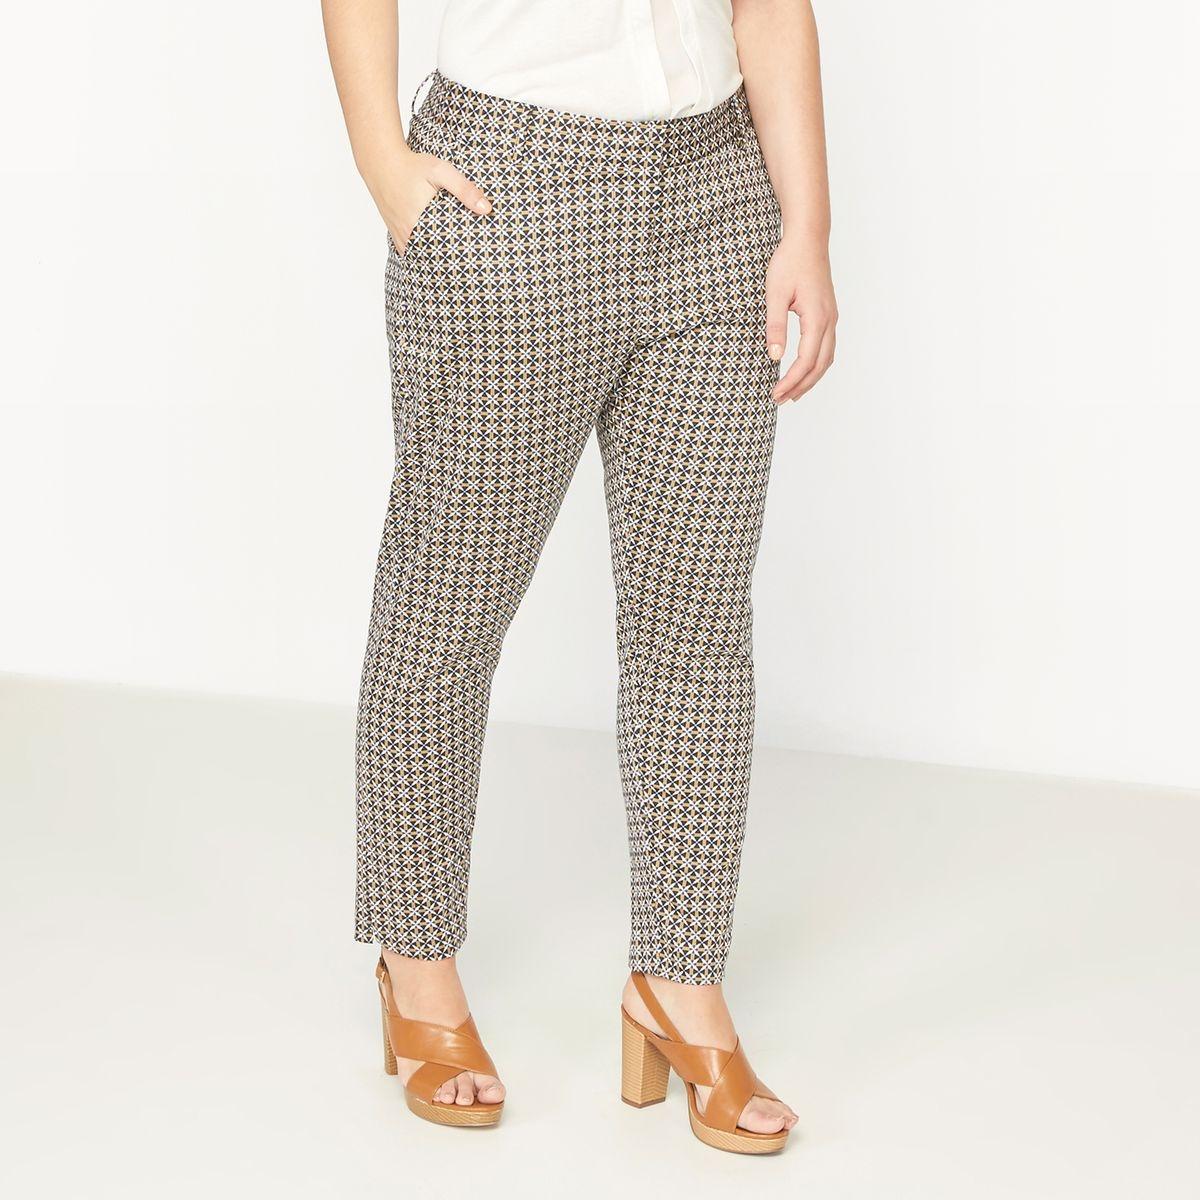 Pantalon fuselé imprimé